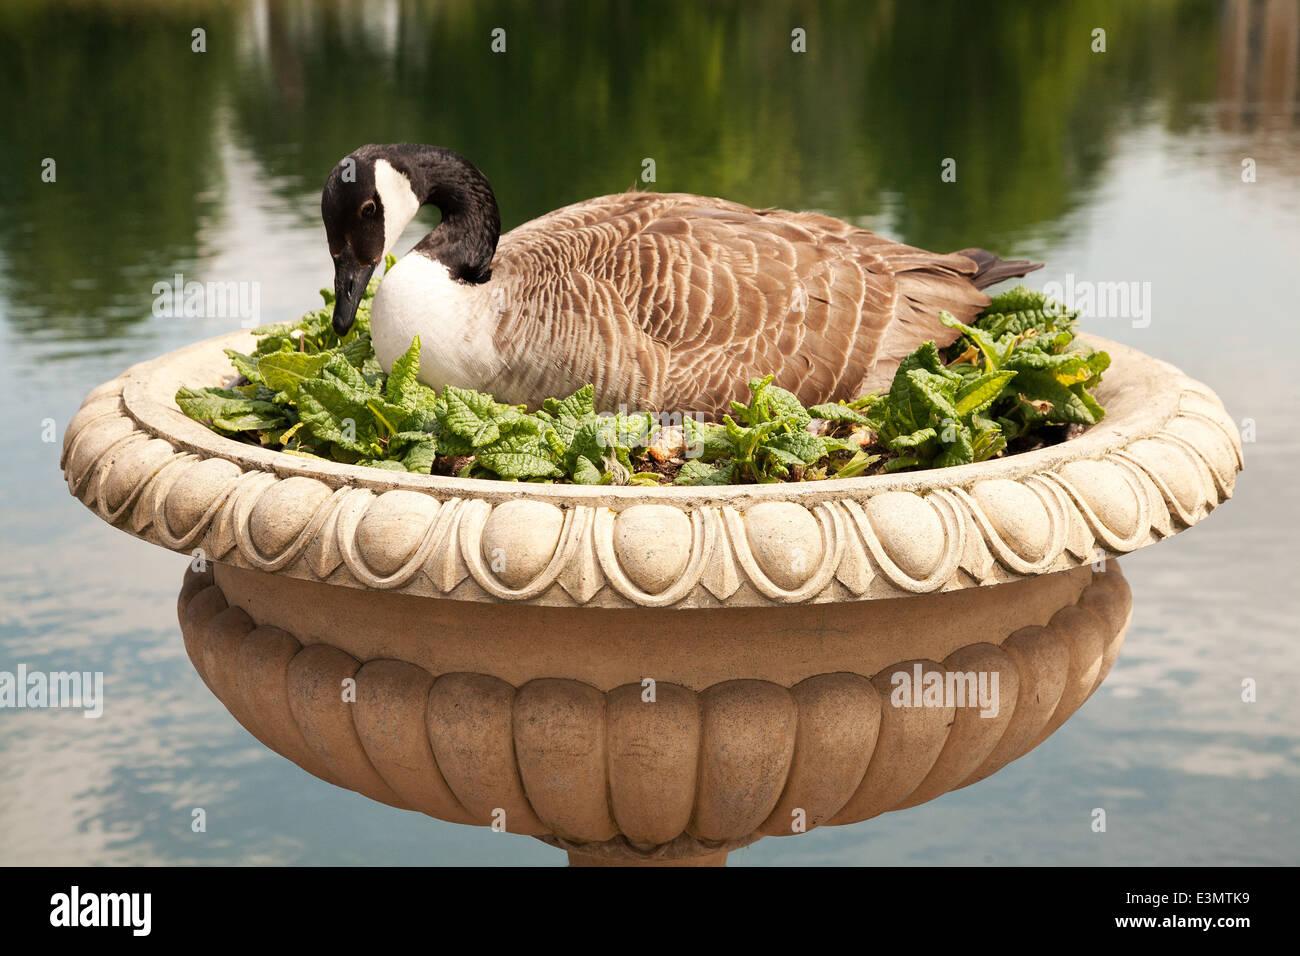 A duck in Kew Royal Botanic Garden,London,UK - Stock Image